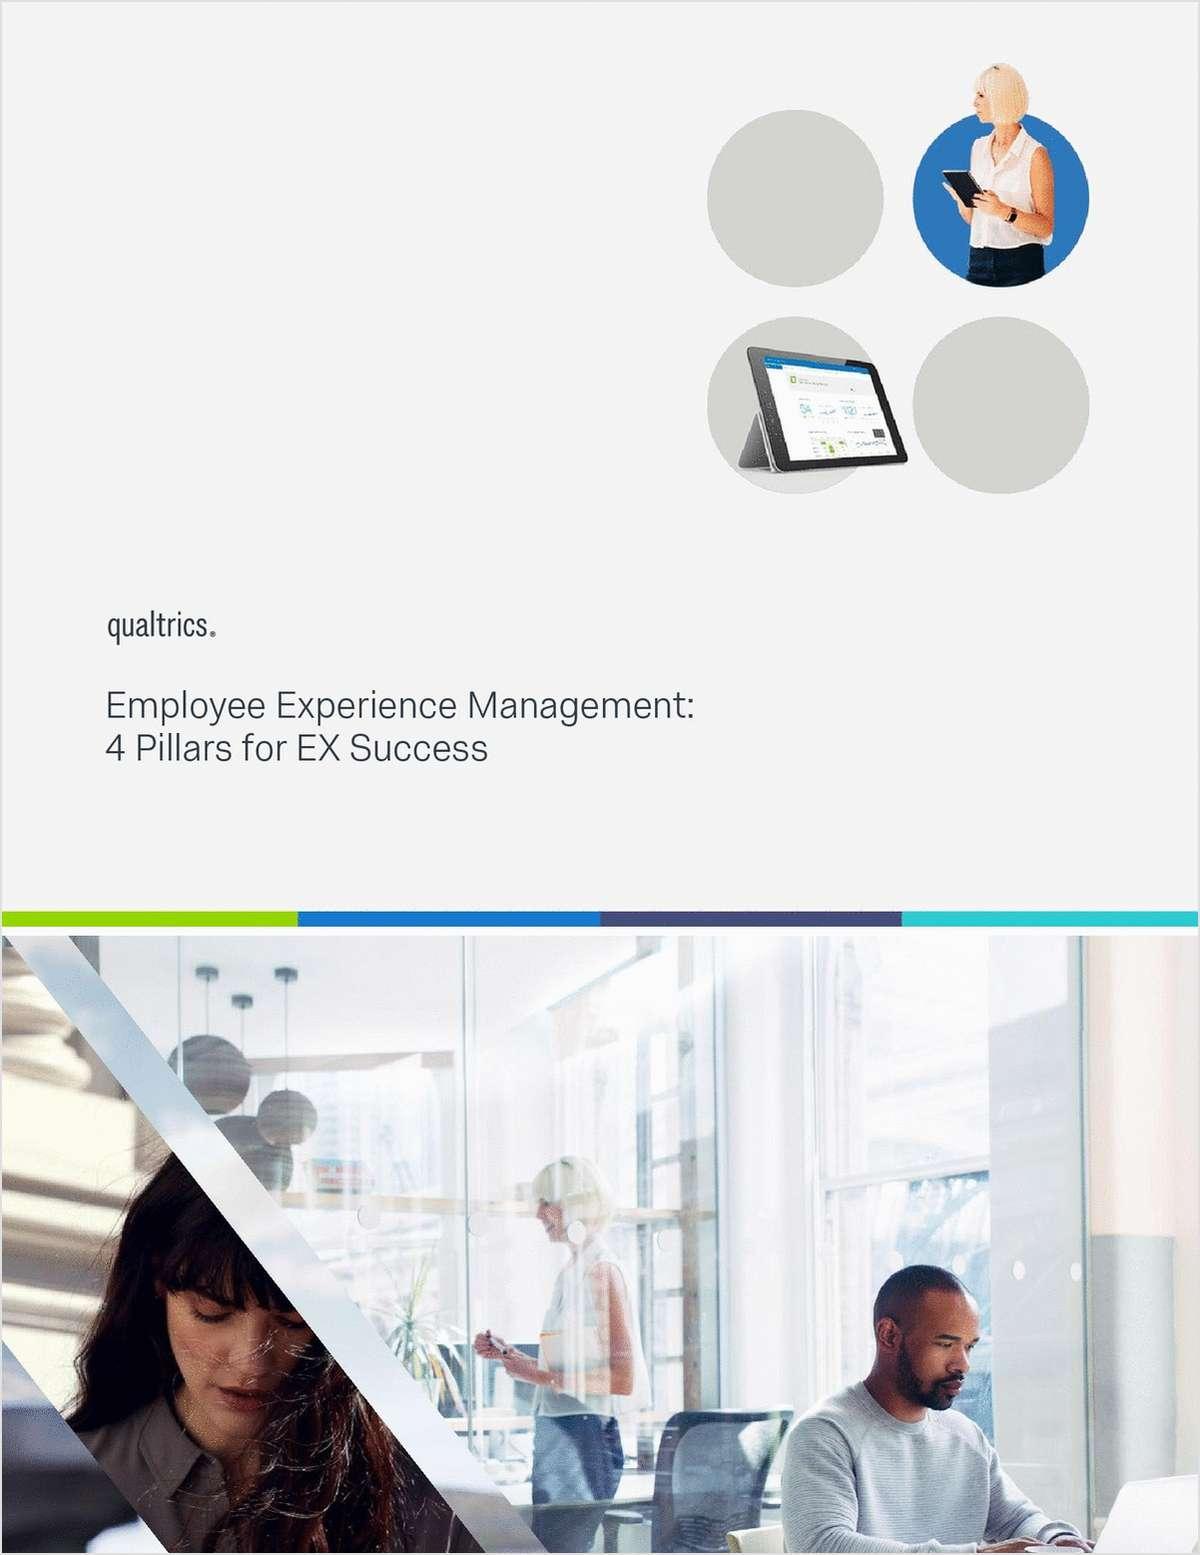 4 Pillars of Employee Experience (EX) Success